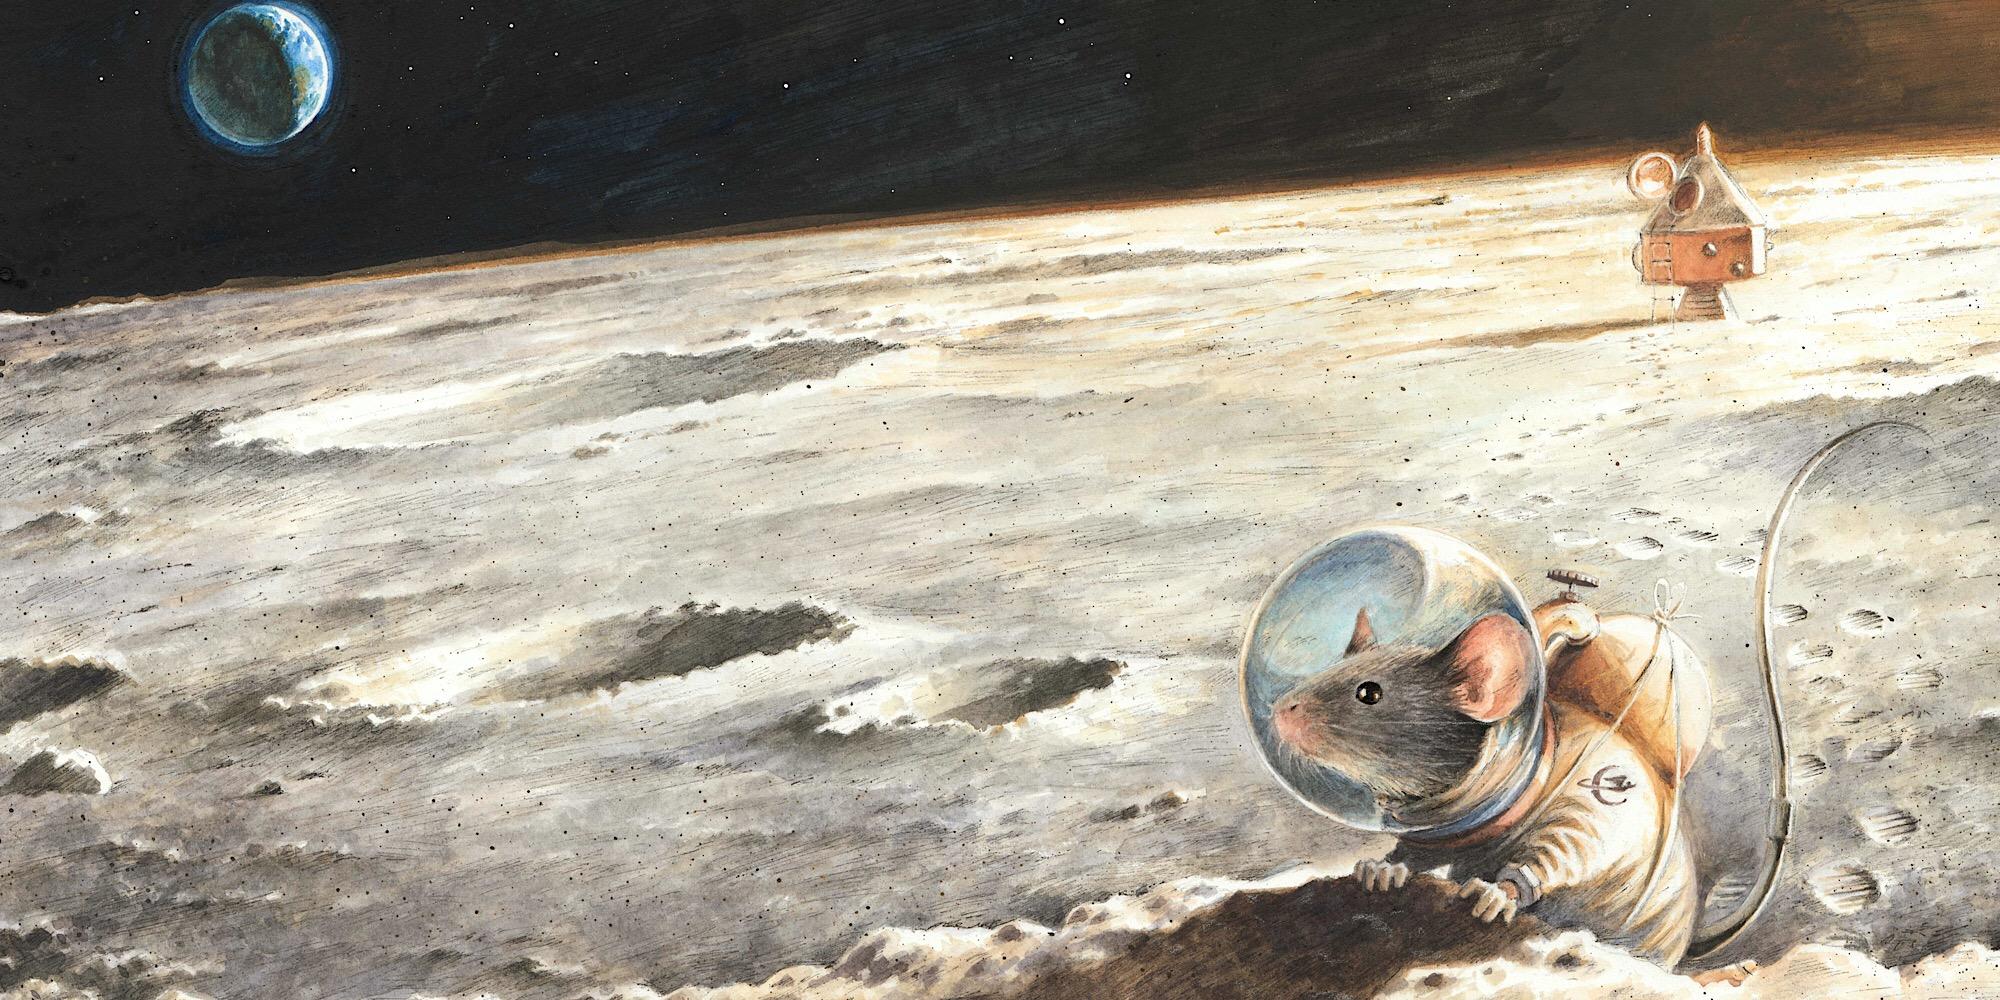 © Torben Kuhlmann, Der erste Erdbewohner auf dem Mond, 2015  © Torben Kuhlmann, NordSüd Verlag AG